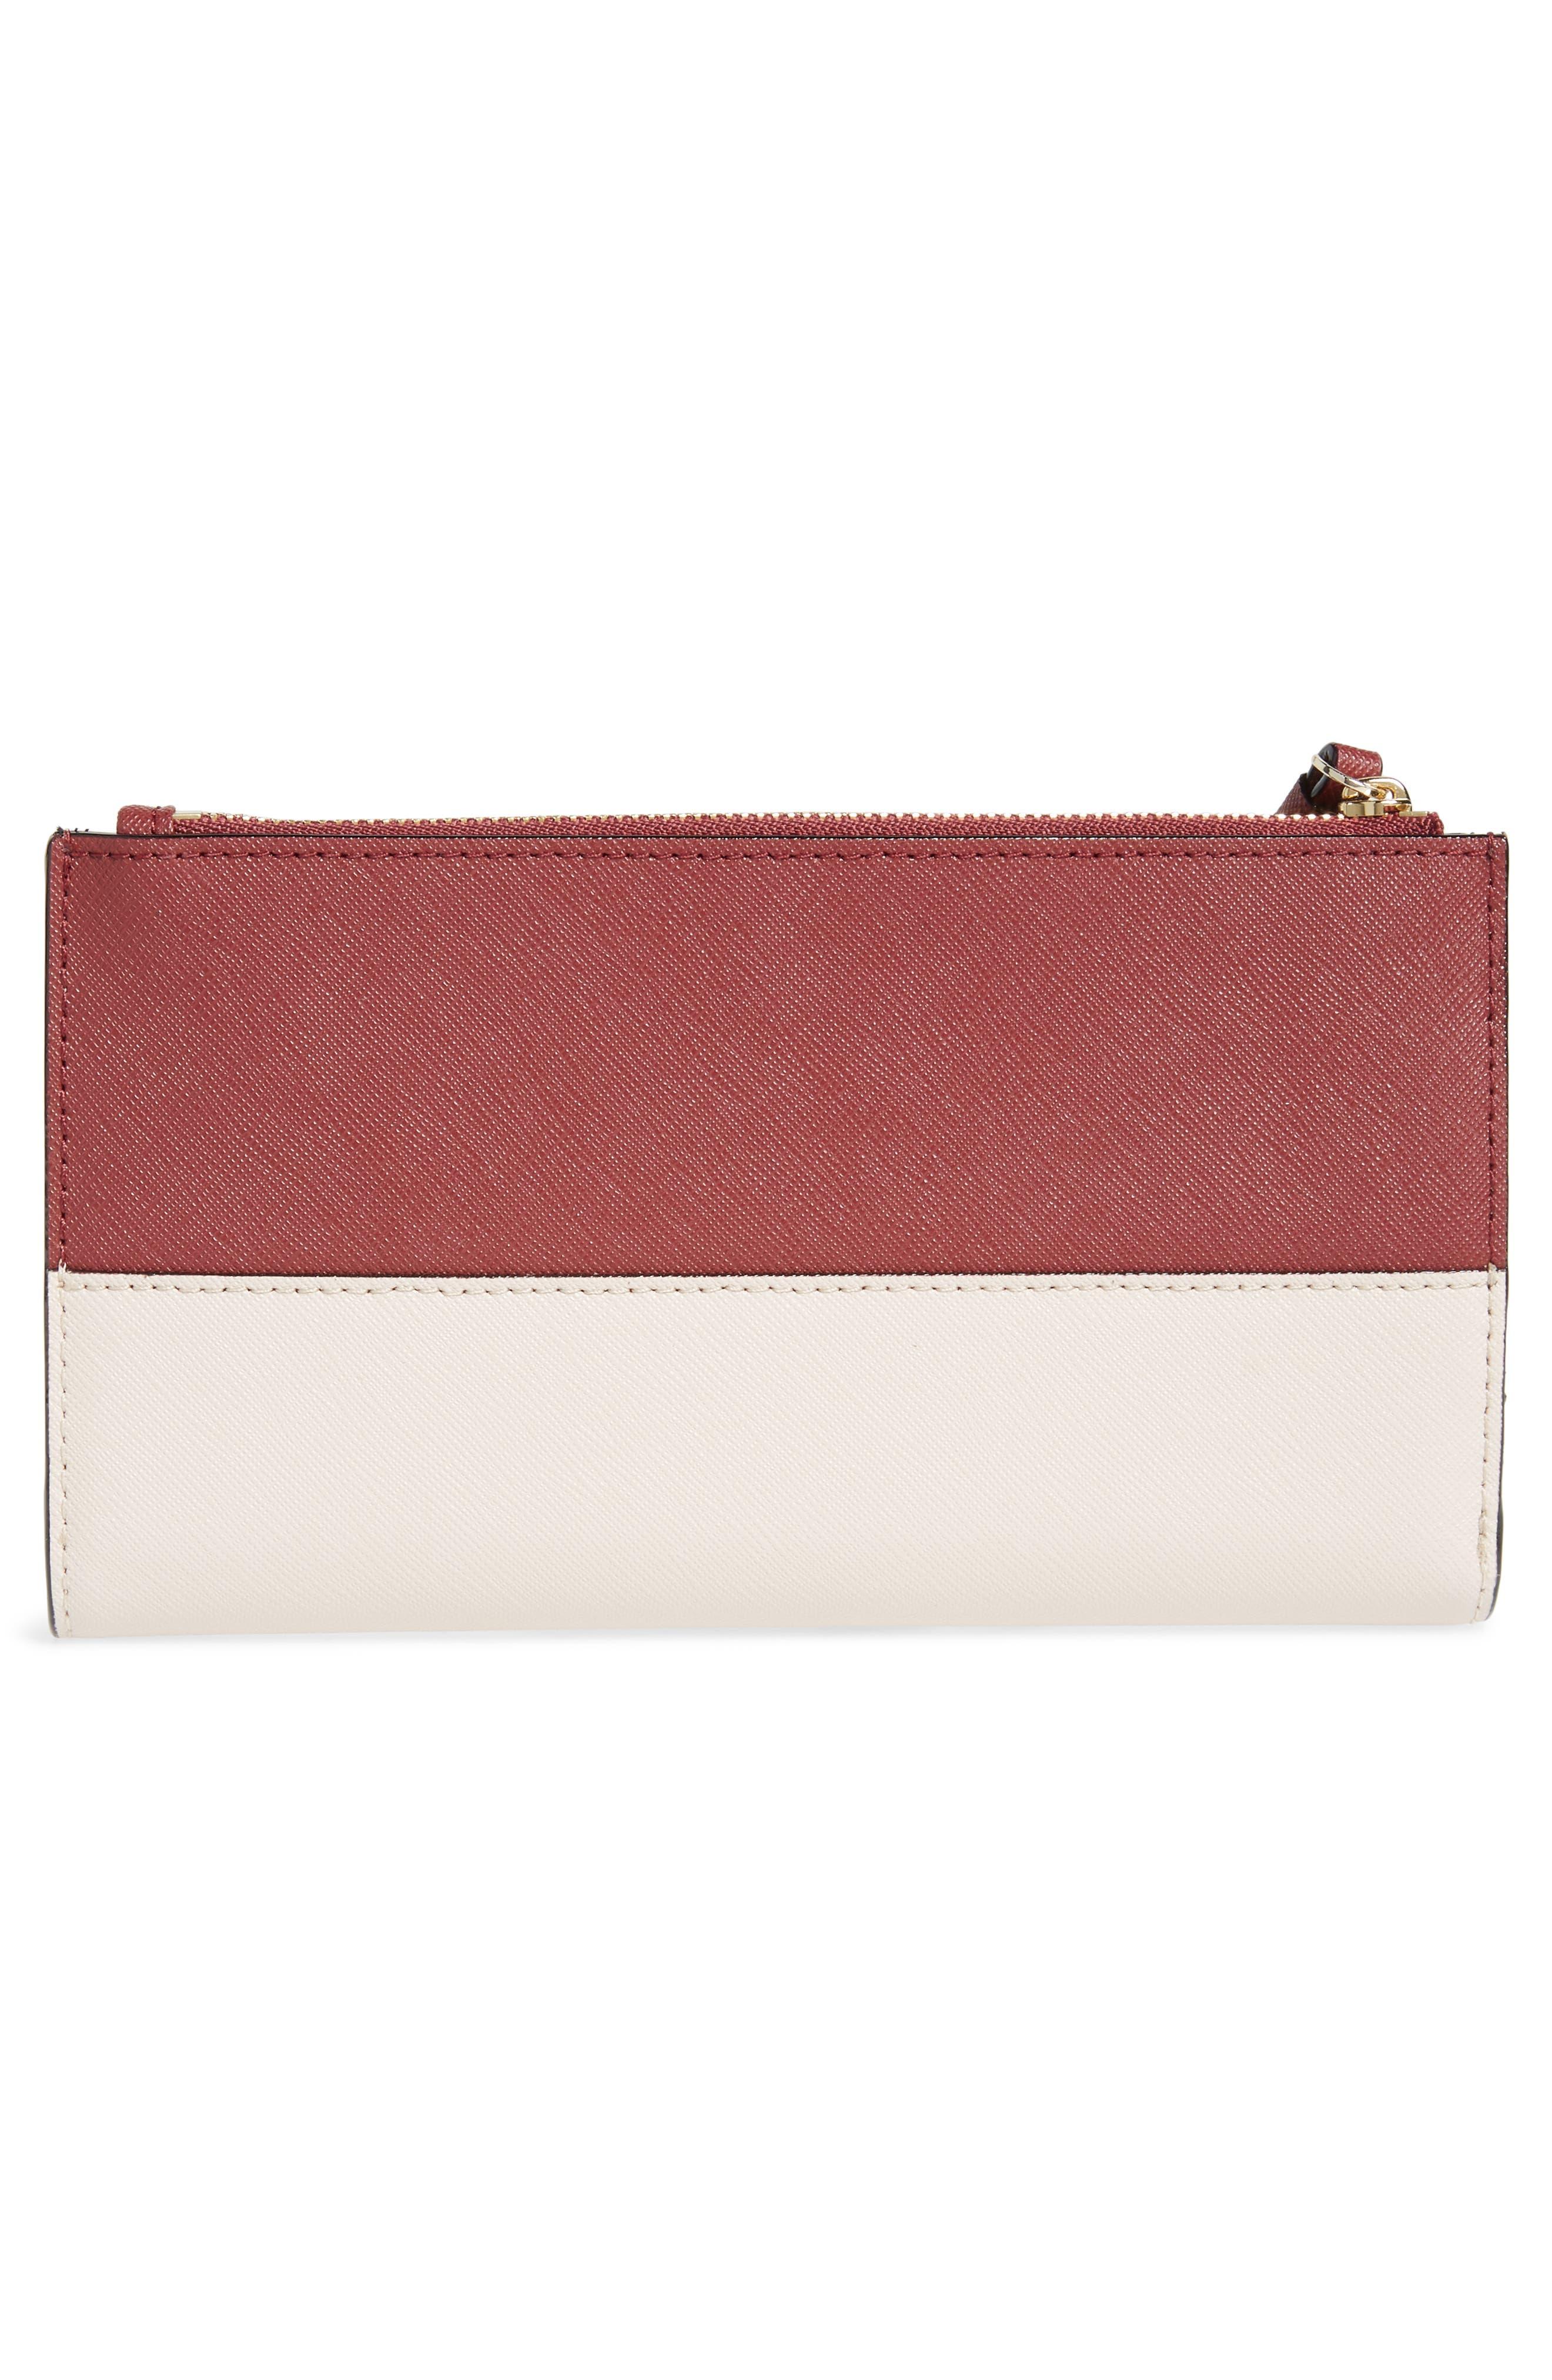 cameron street - eliza leather wallet,                             Alternate thumbnail 6, color,                             Sienna/ Tusk